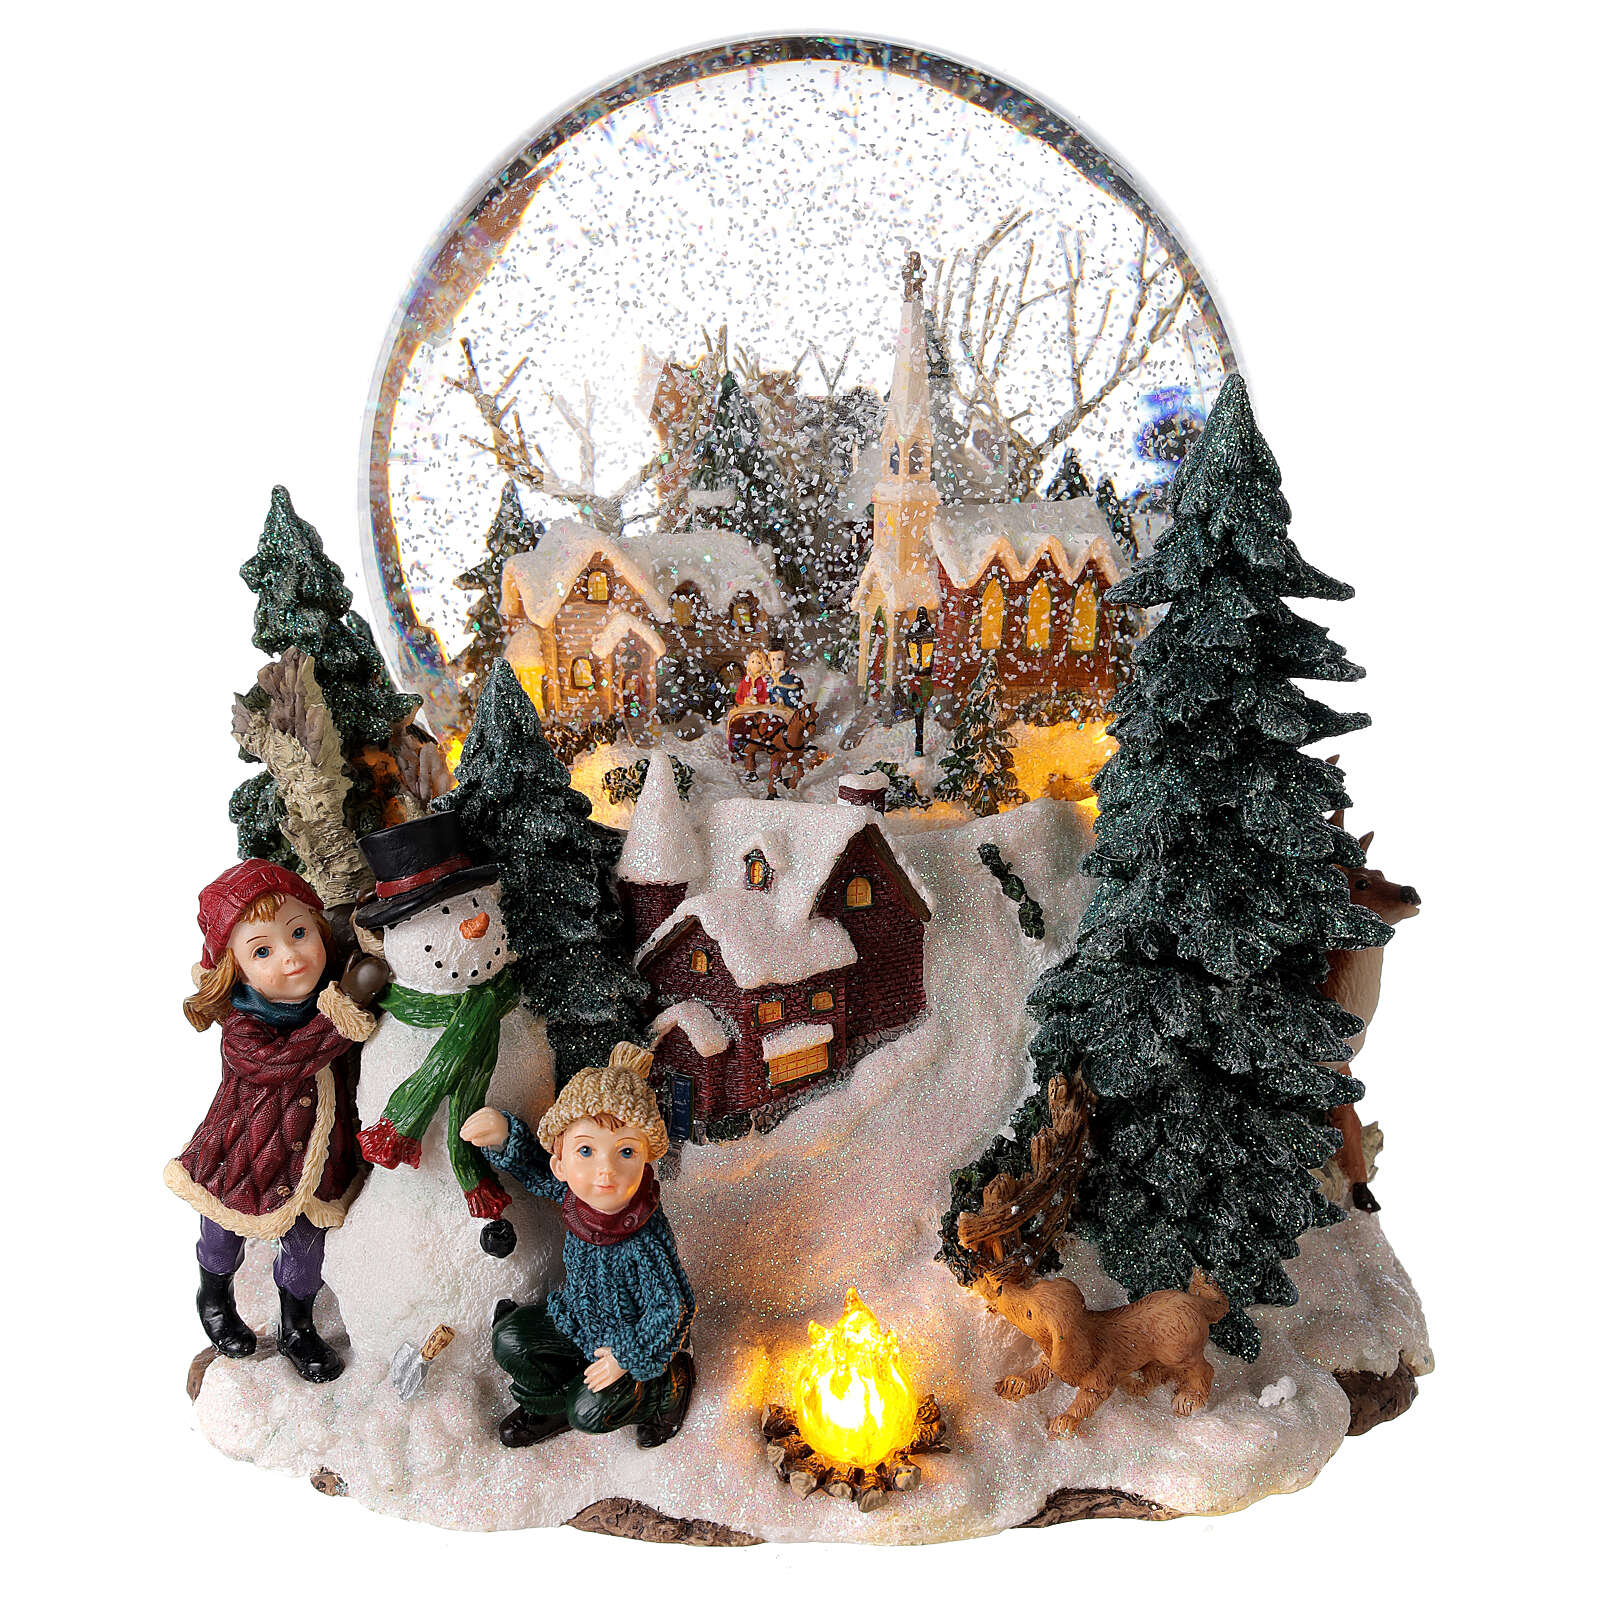 Snow globe winter village music lights 25x20x25 cm 3